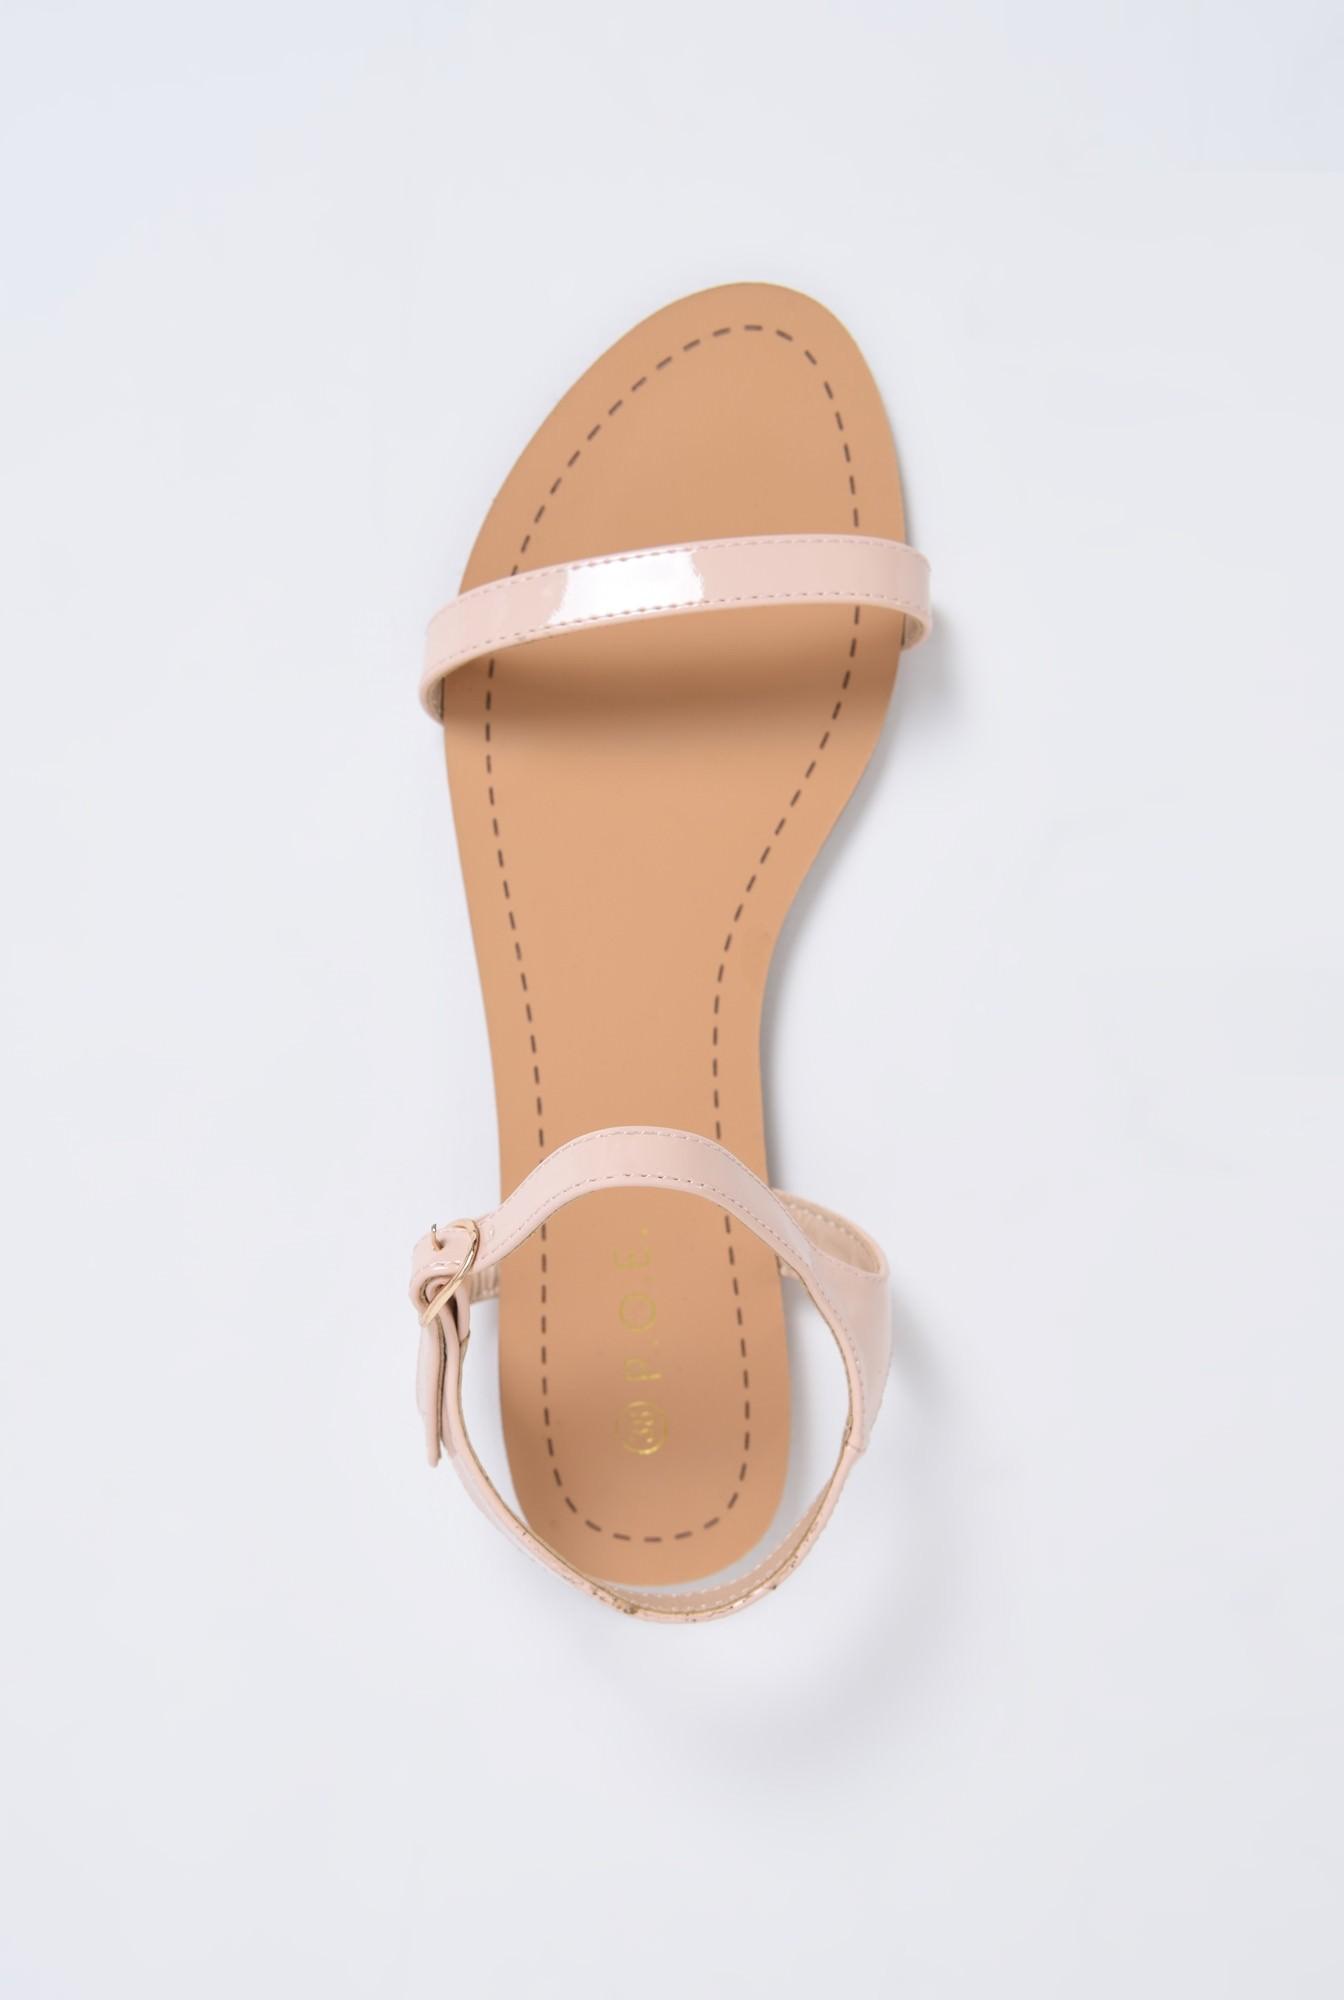 2 - sandale din lac, crem, minimaliste, talpa joasa